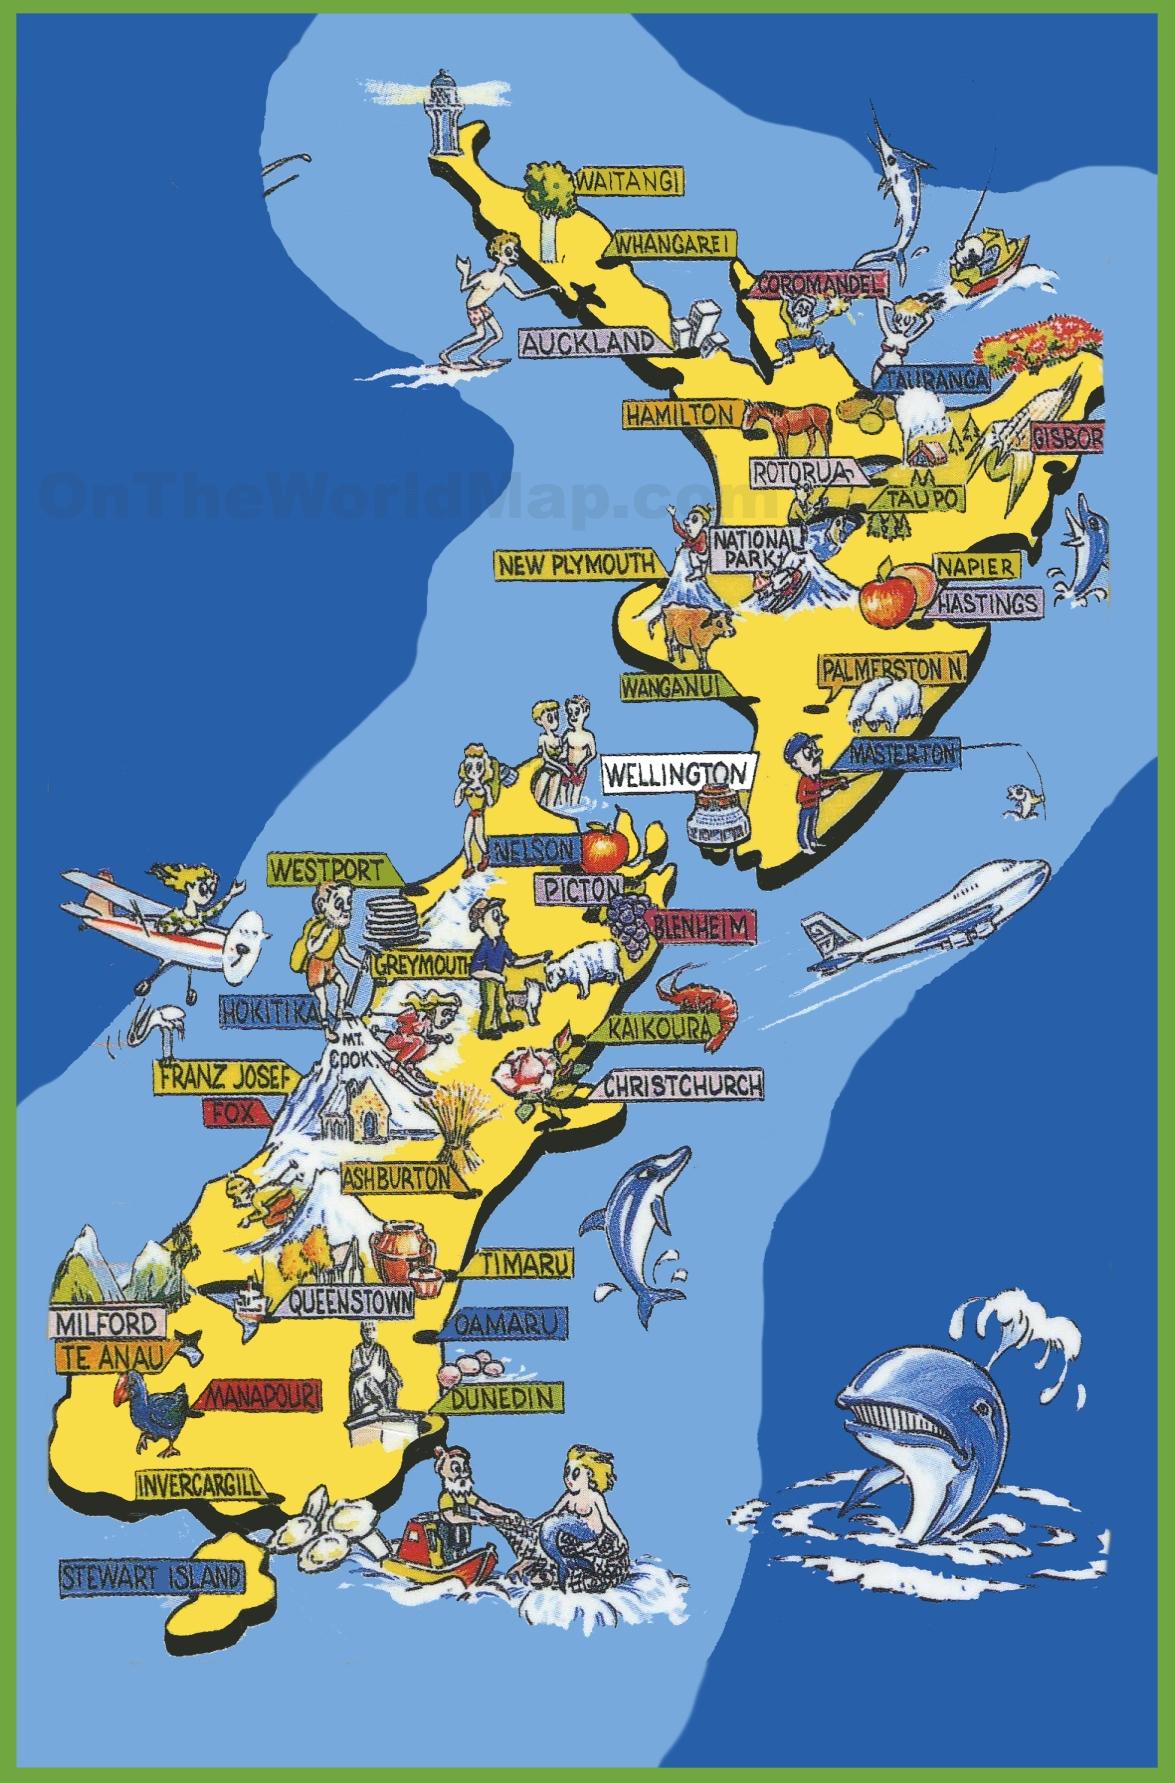 New Zealand Must See Map.New Zealand Must See Map Unsecureflight Nl